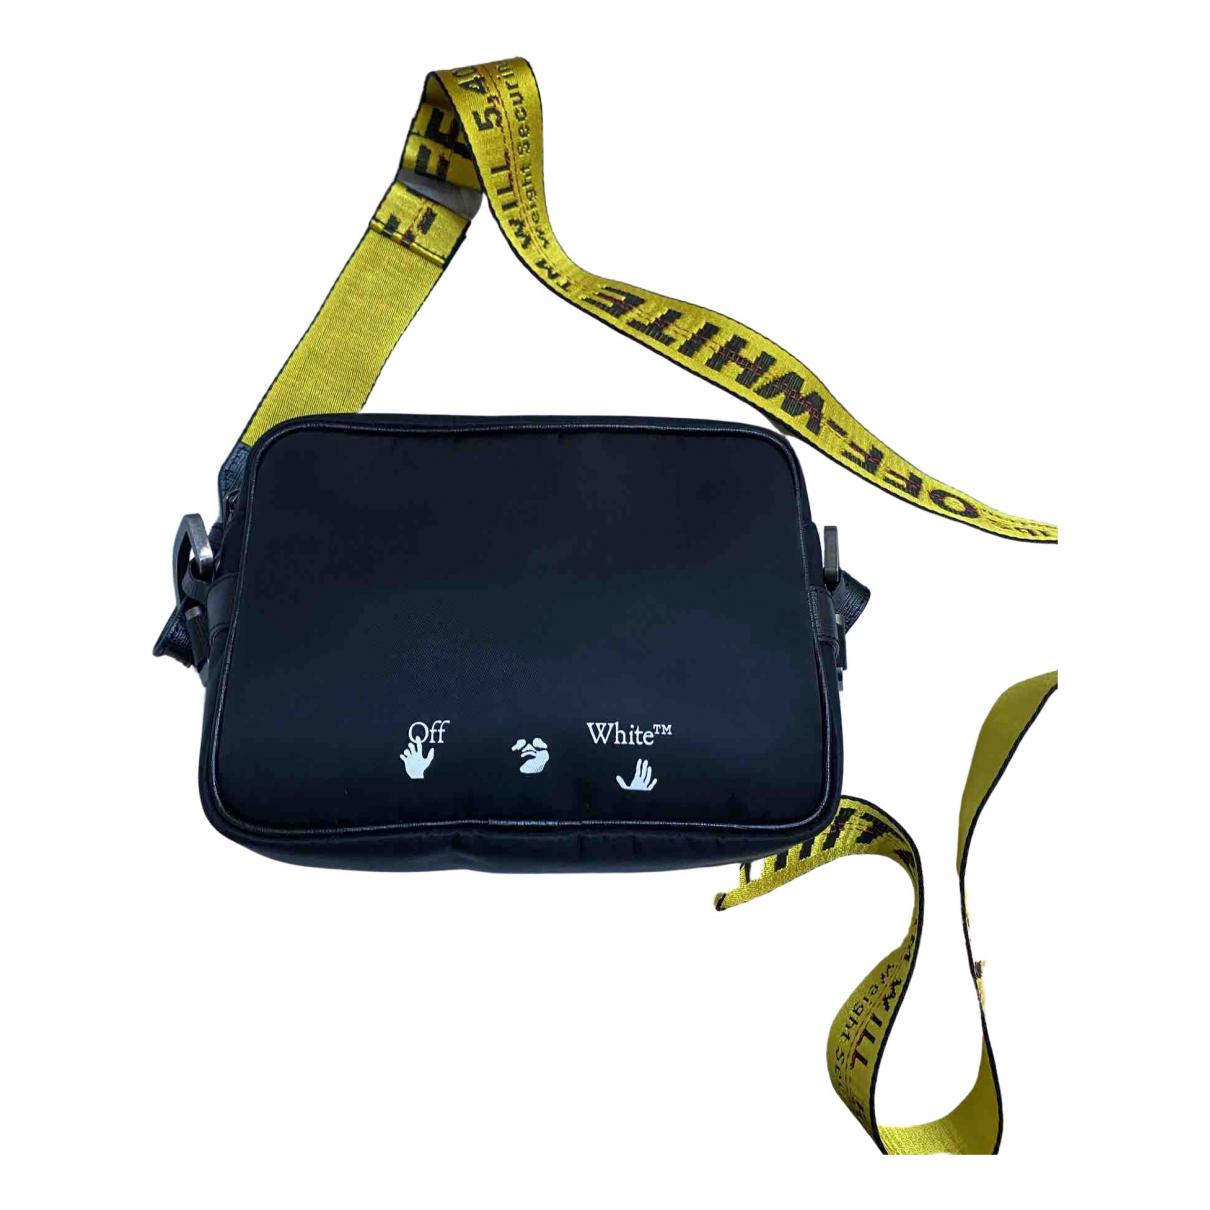 Off-white N Black Small bag, wallet & cases for Men N